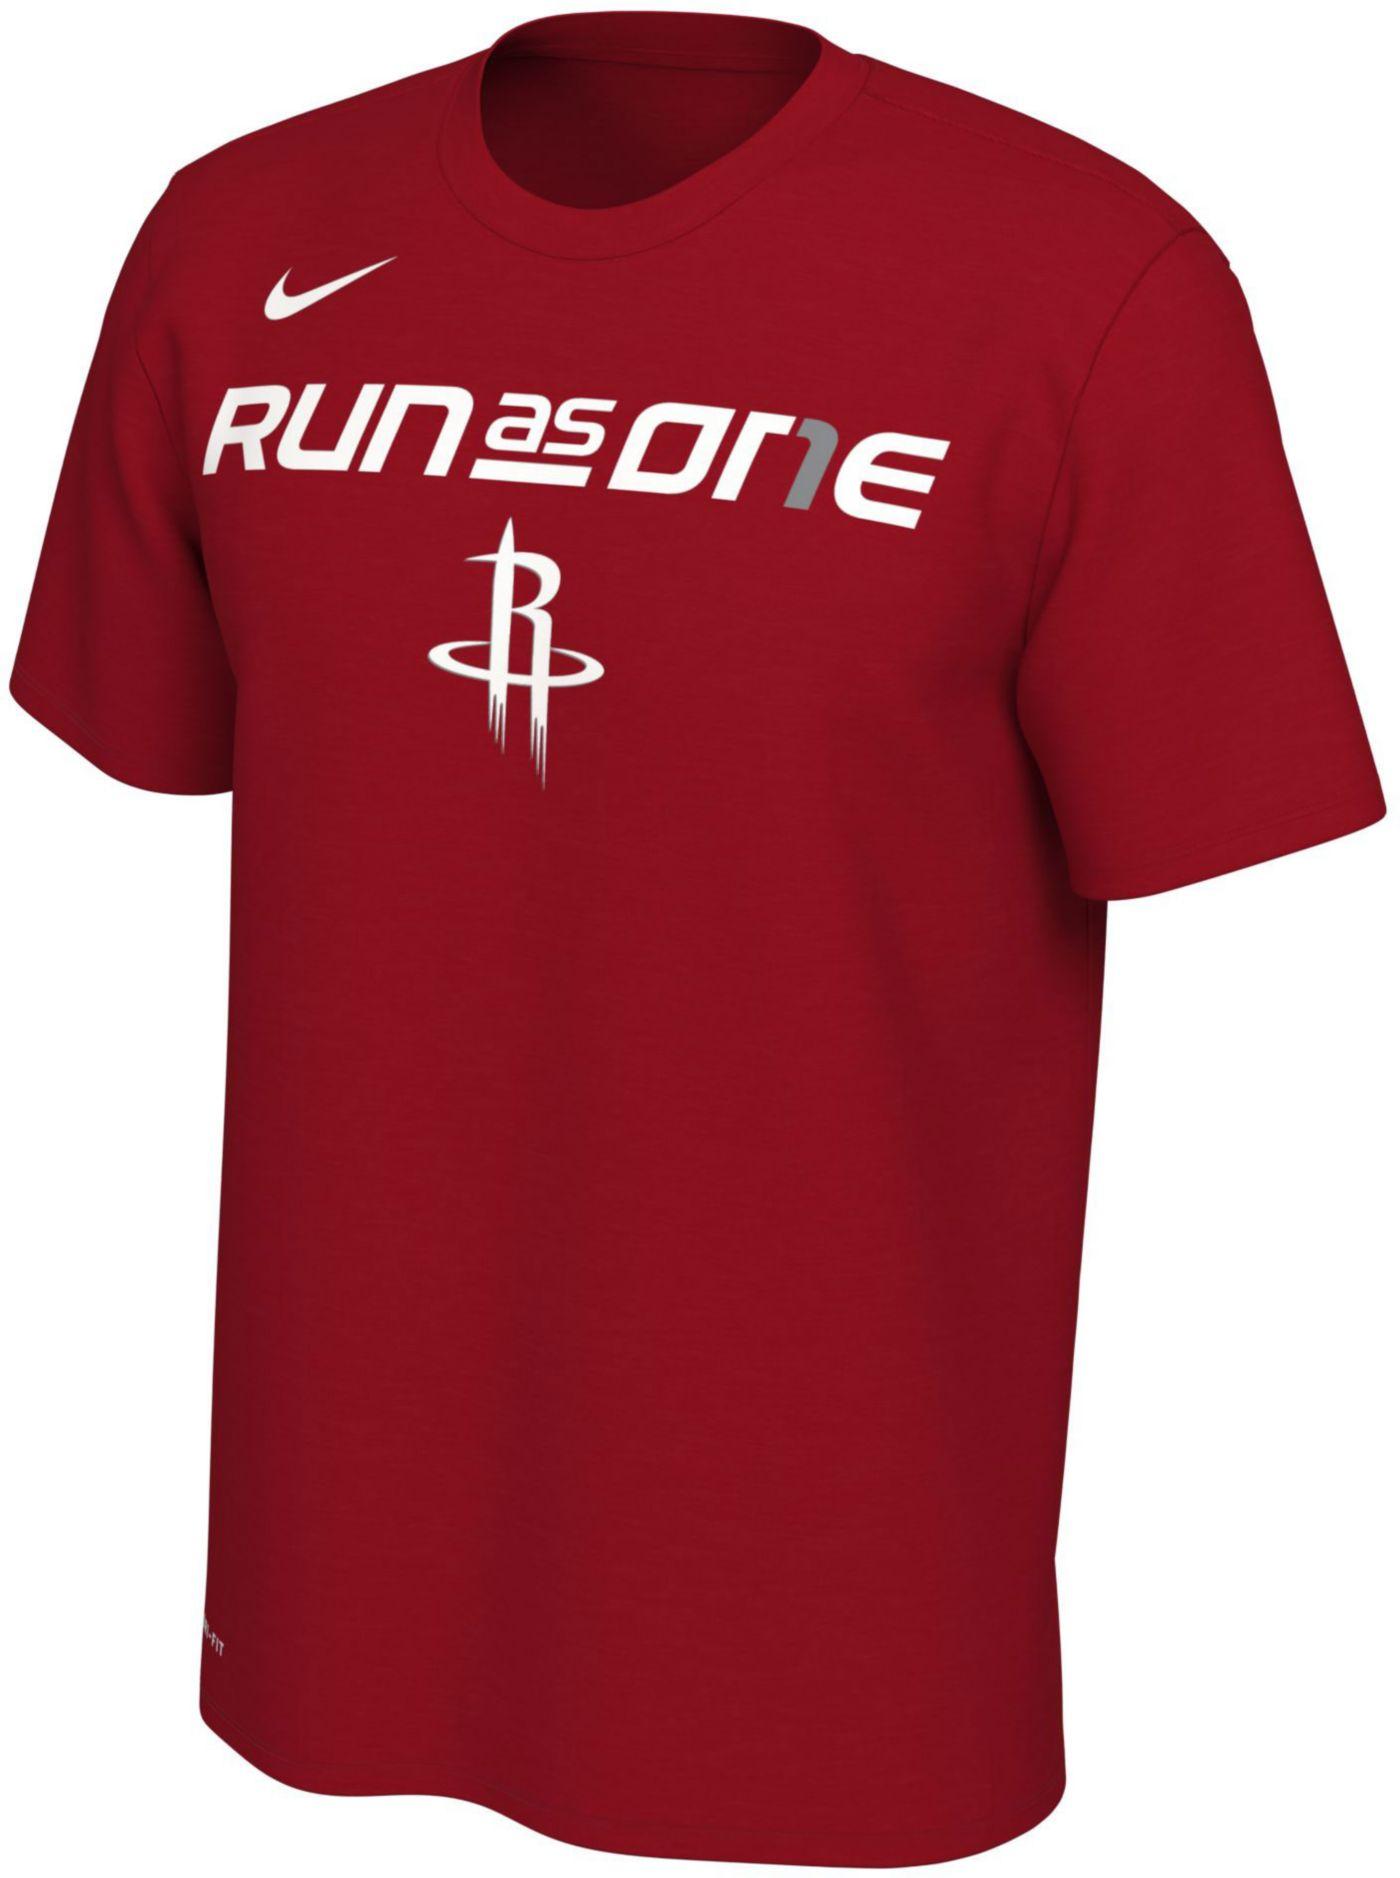 "Nike Men's Houston Rockets 2019 Playoffs ""Run As One"" Dri-FIT T-Shirt"